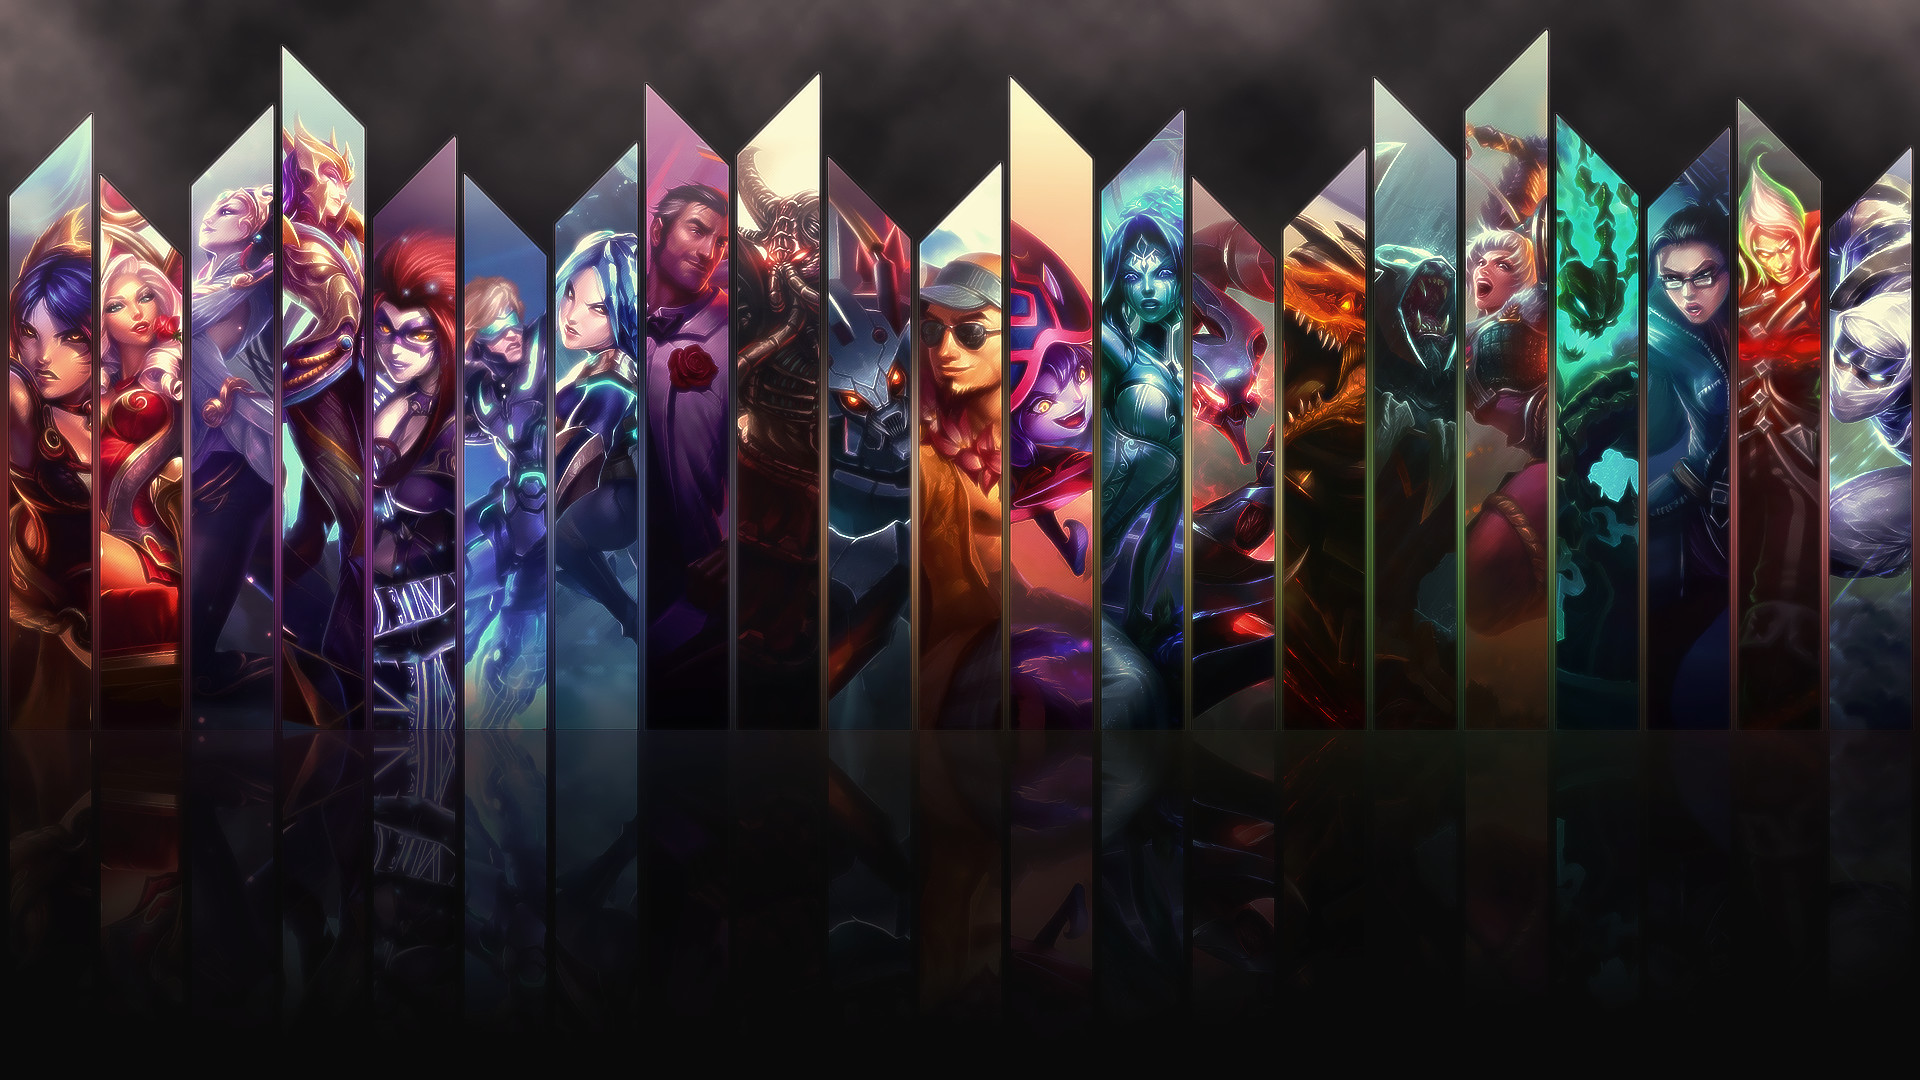 Nidalee League Of Legends Wallpapers HD | League Of Legends |  Pinterest | Wallpaper